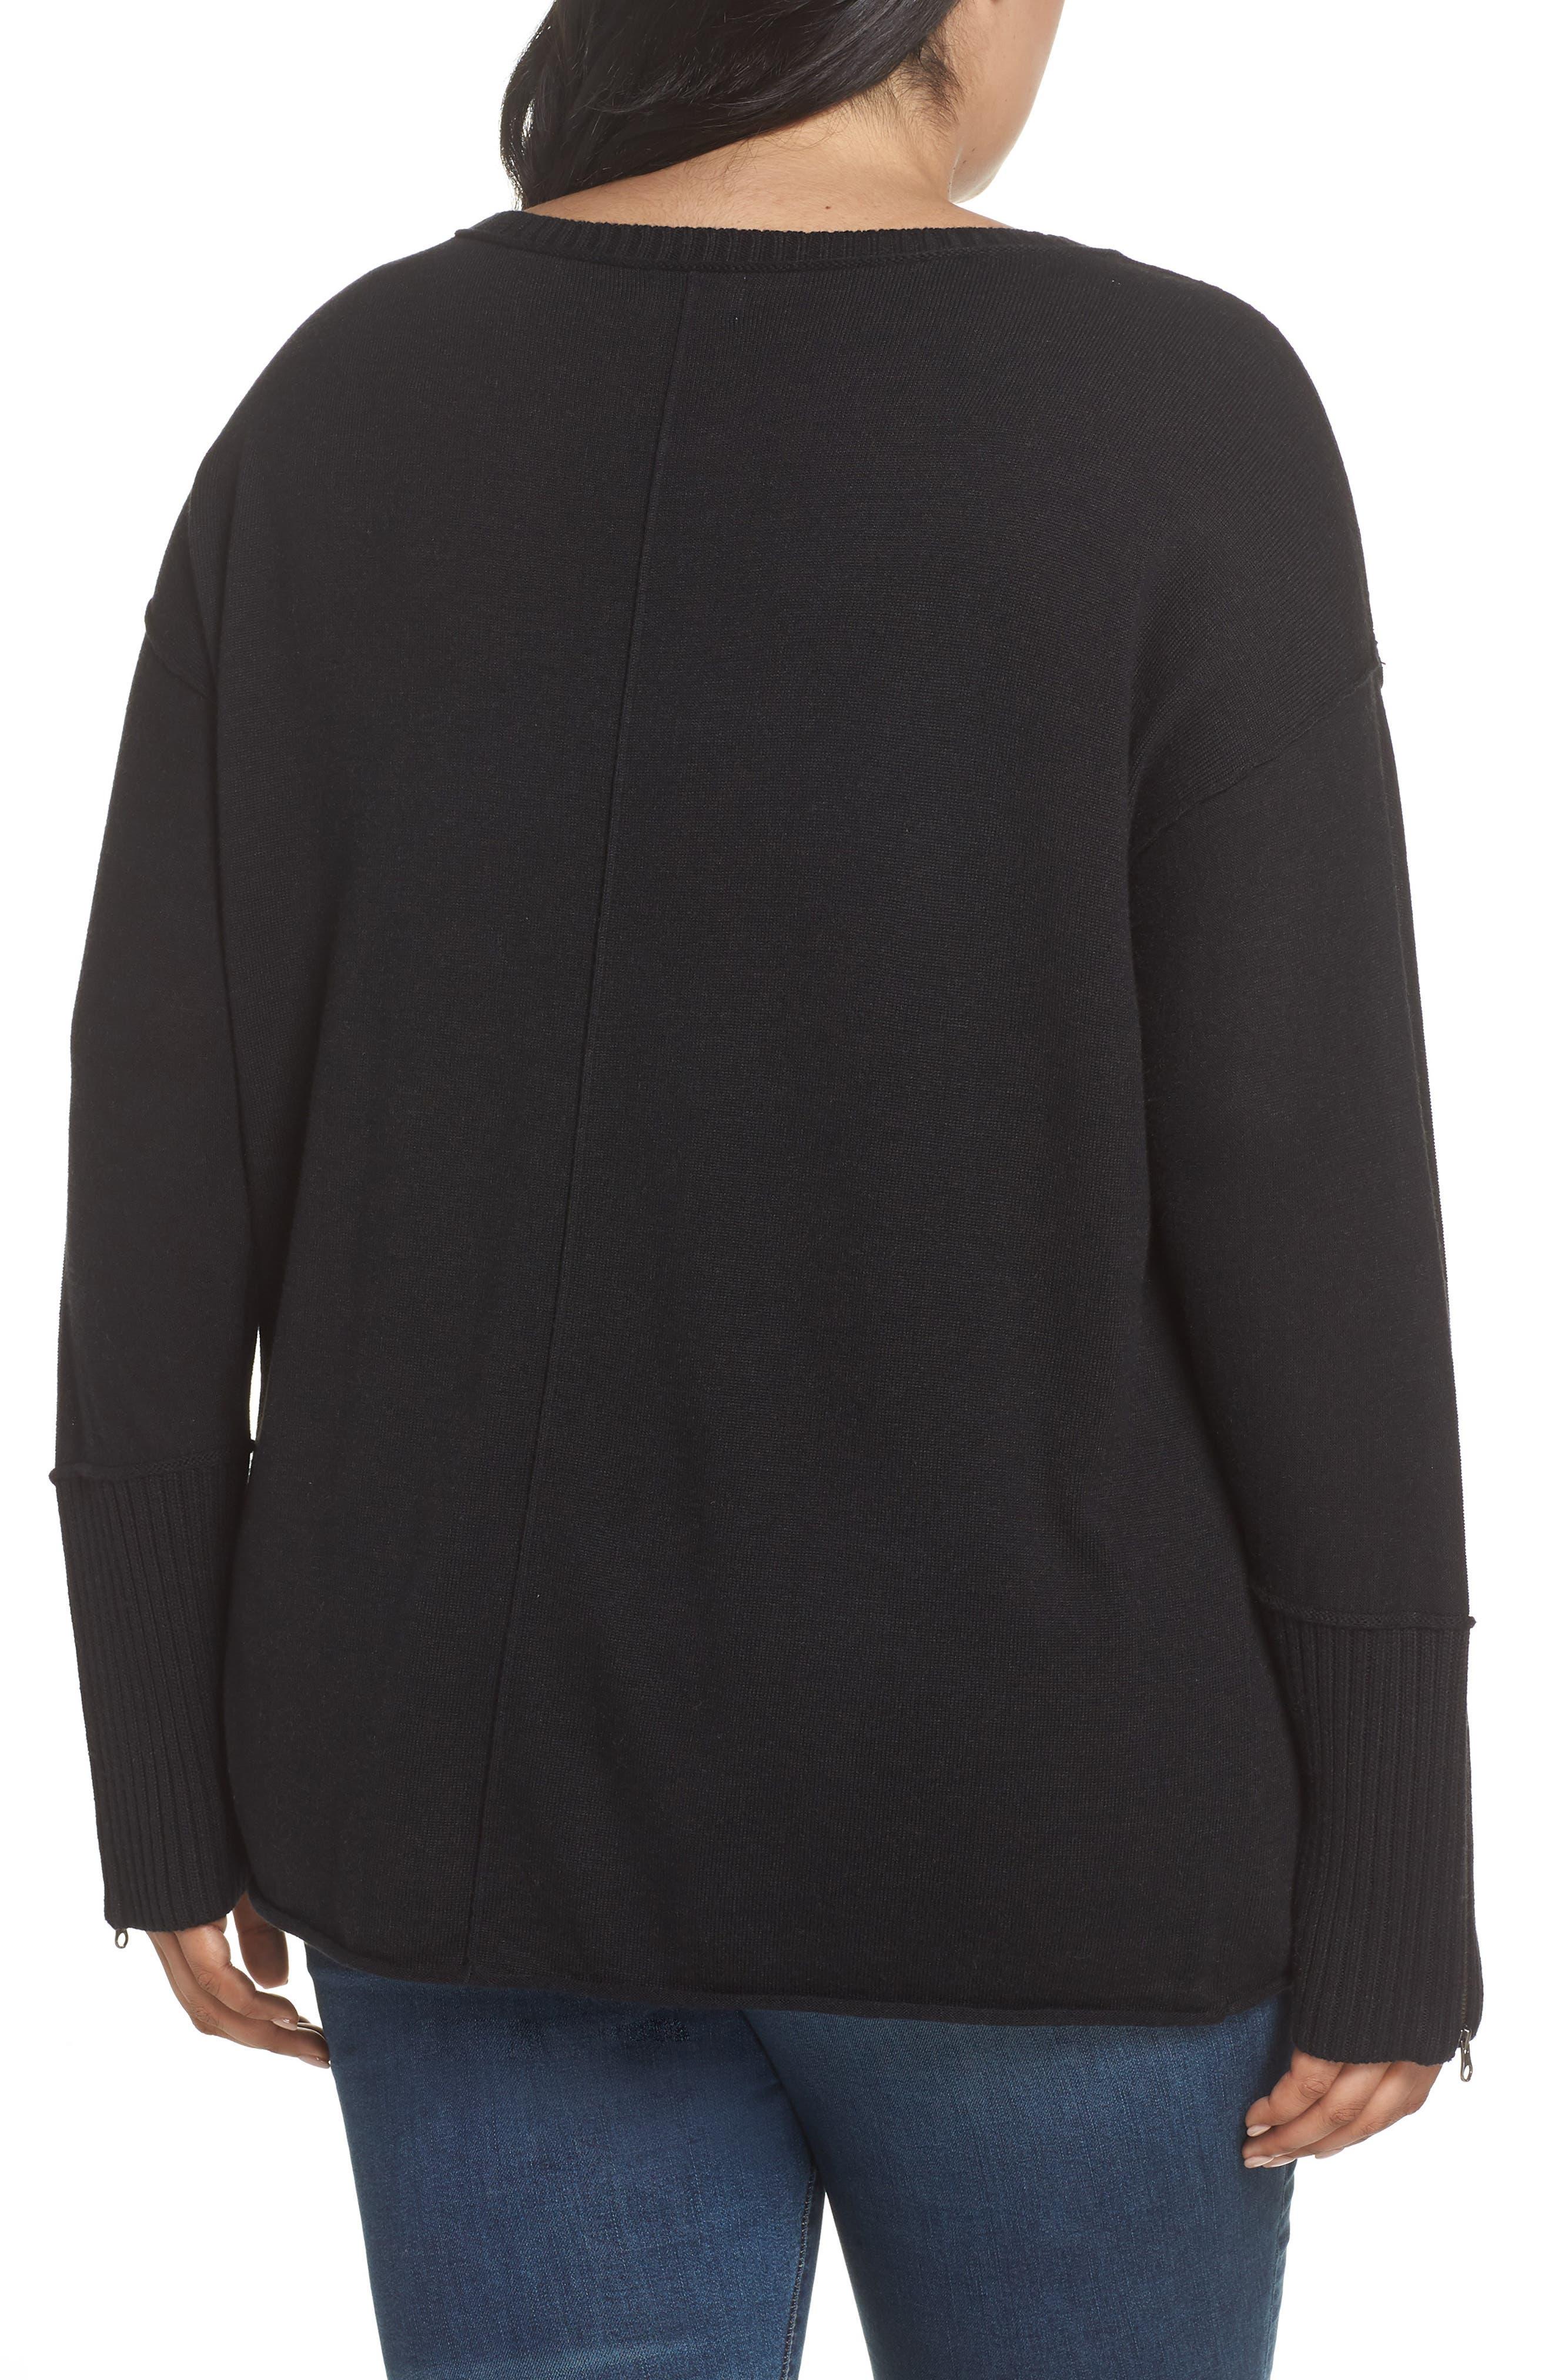 Mix Gauge Zip Cuff Sweater,                             Alternate thumbnail 2, color,                             001